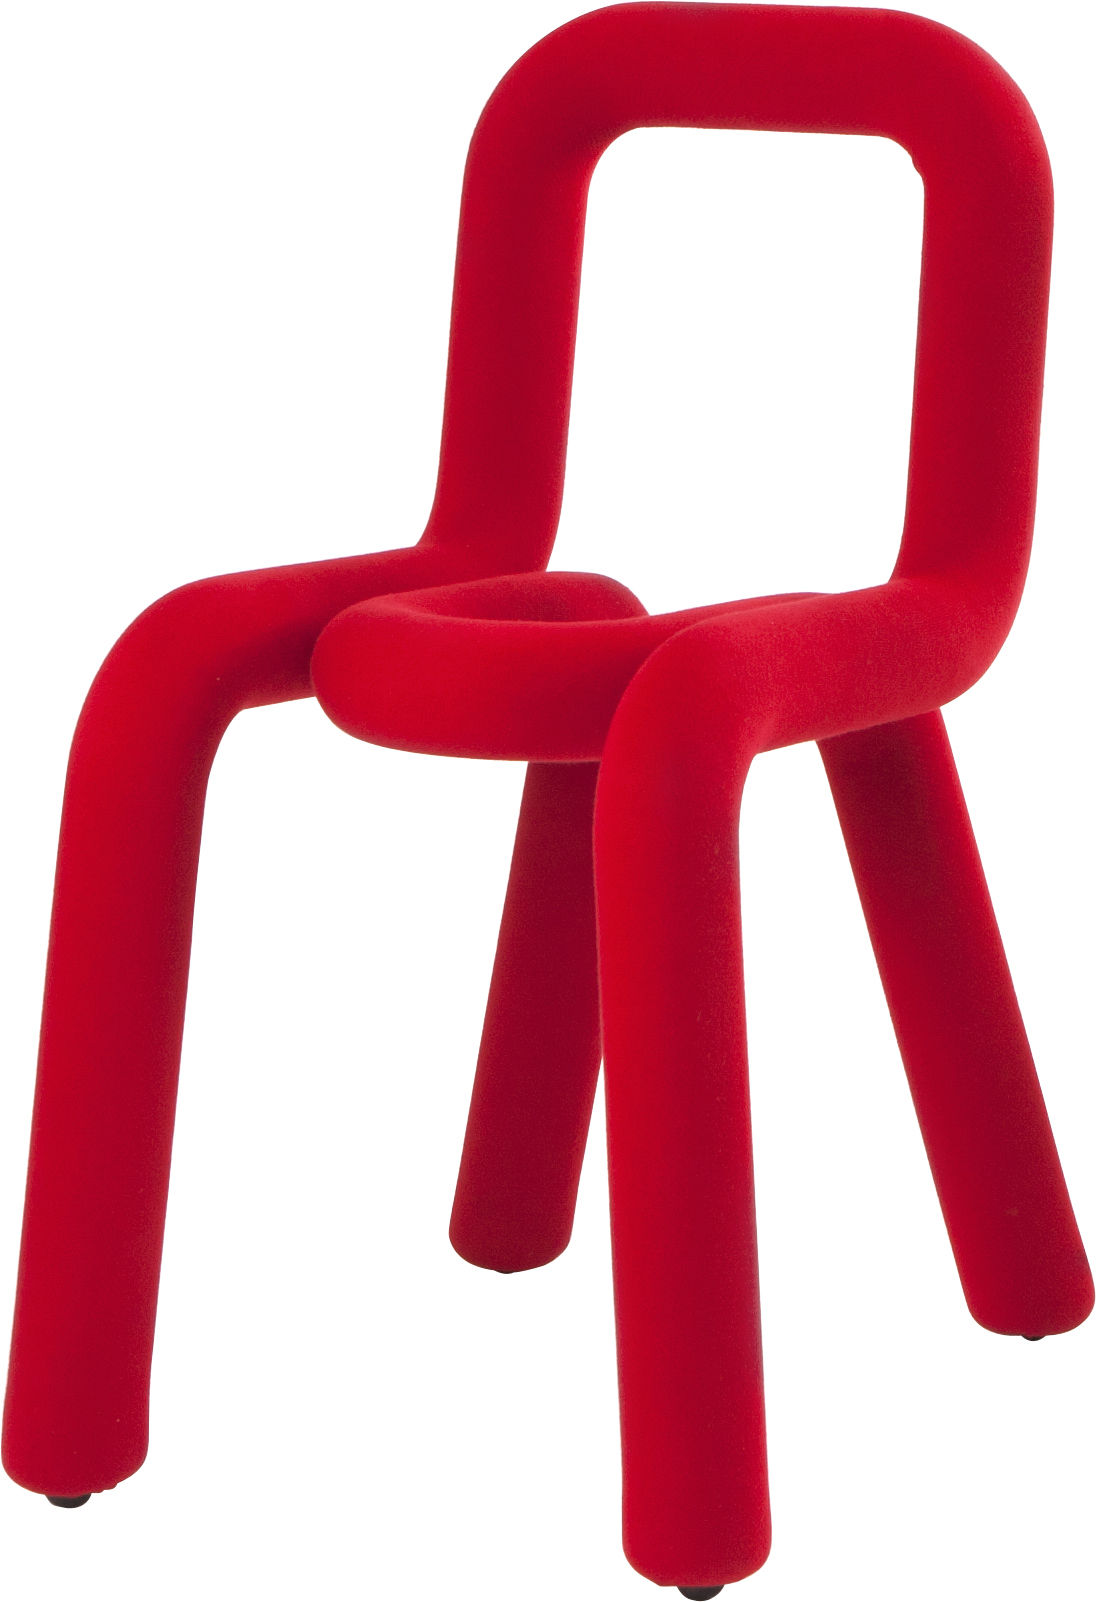 Möbel - Stühle  - Bold Gepolsterter Stuhl - Moustache - Rot - Gewebe, Polyurethan-Schaum, Stahl